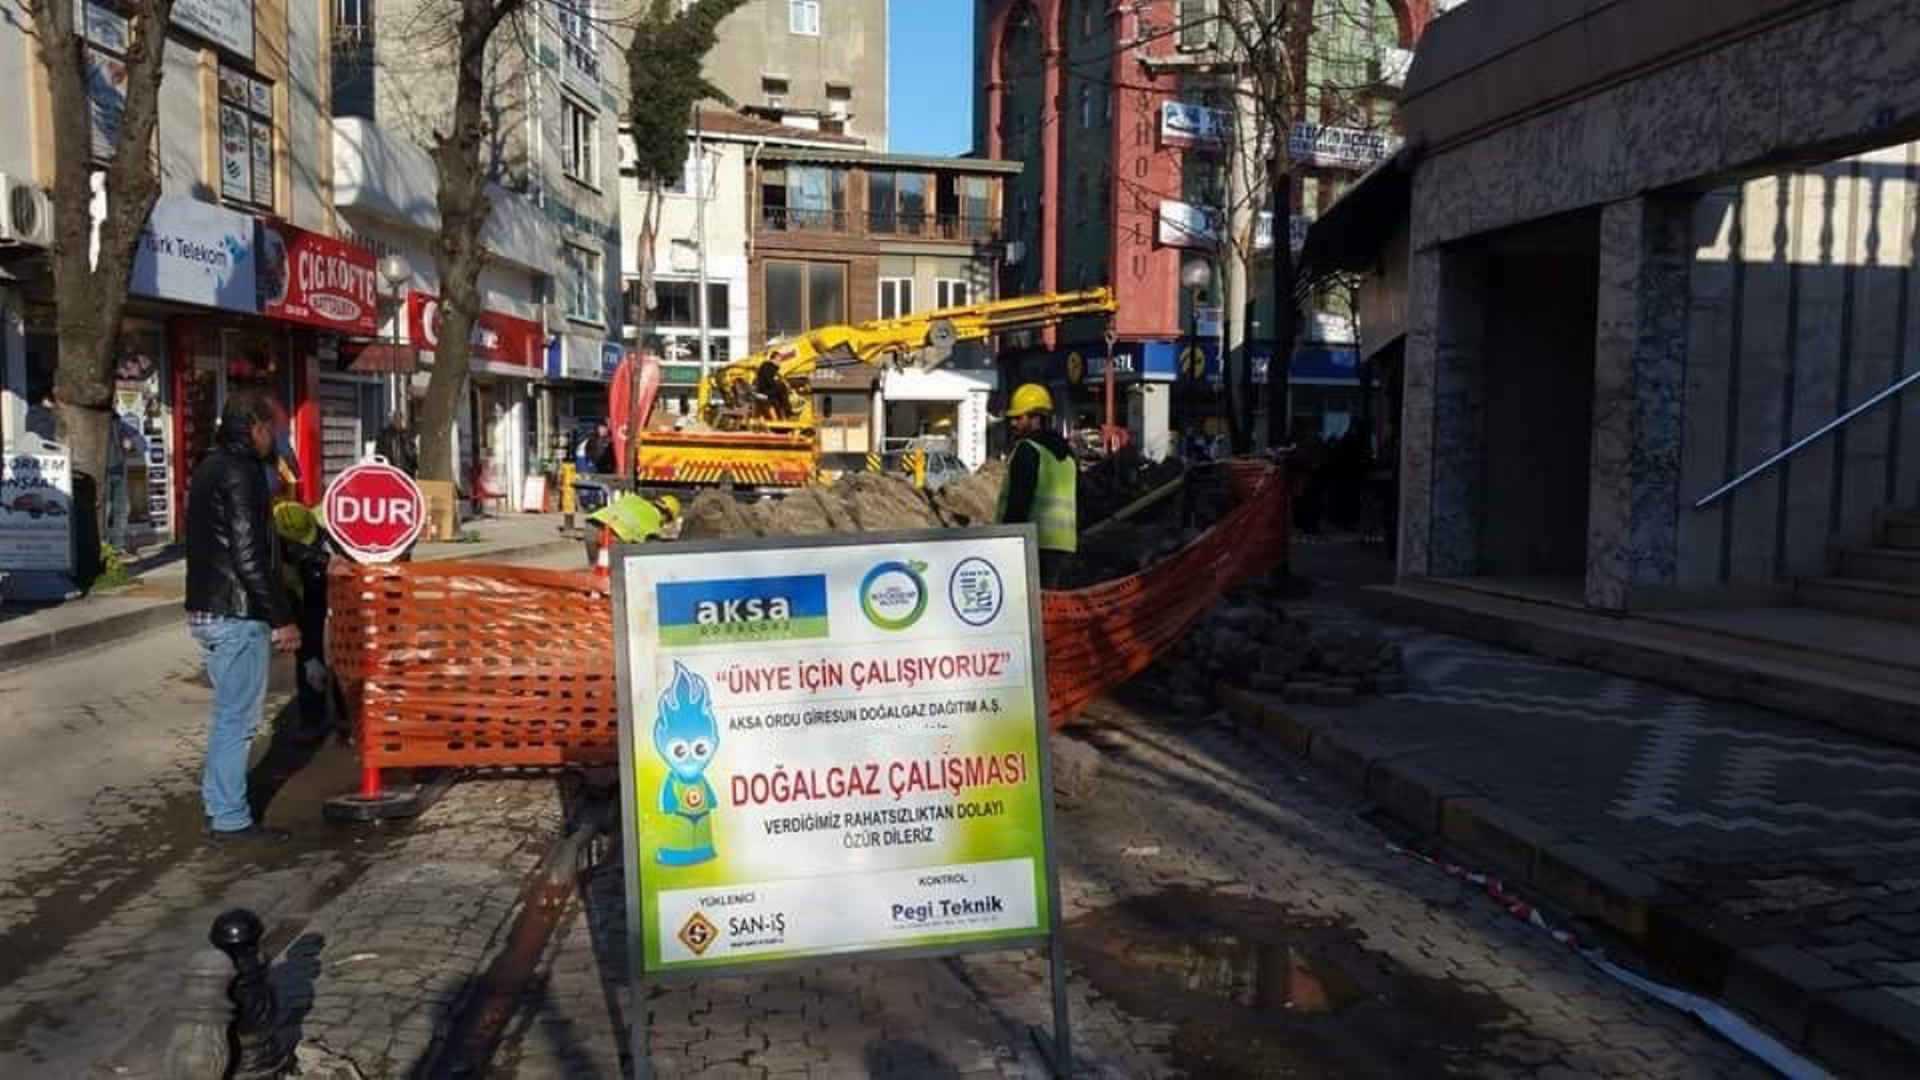 ÜNYE'DE 6 MAHALLEYE DOĞAL GAZ VERİLDİ